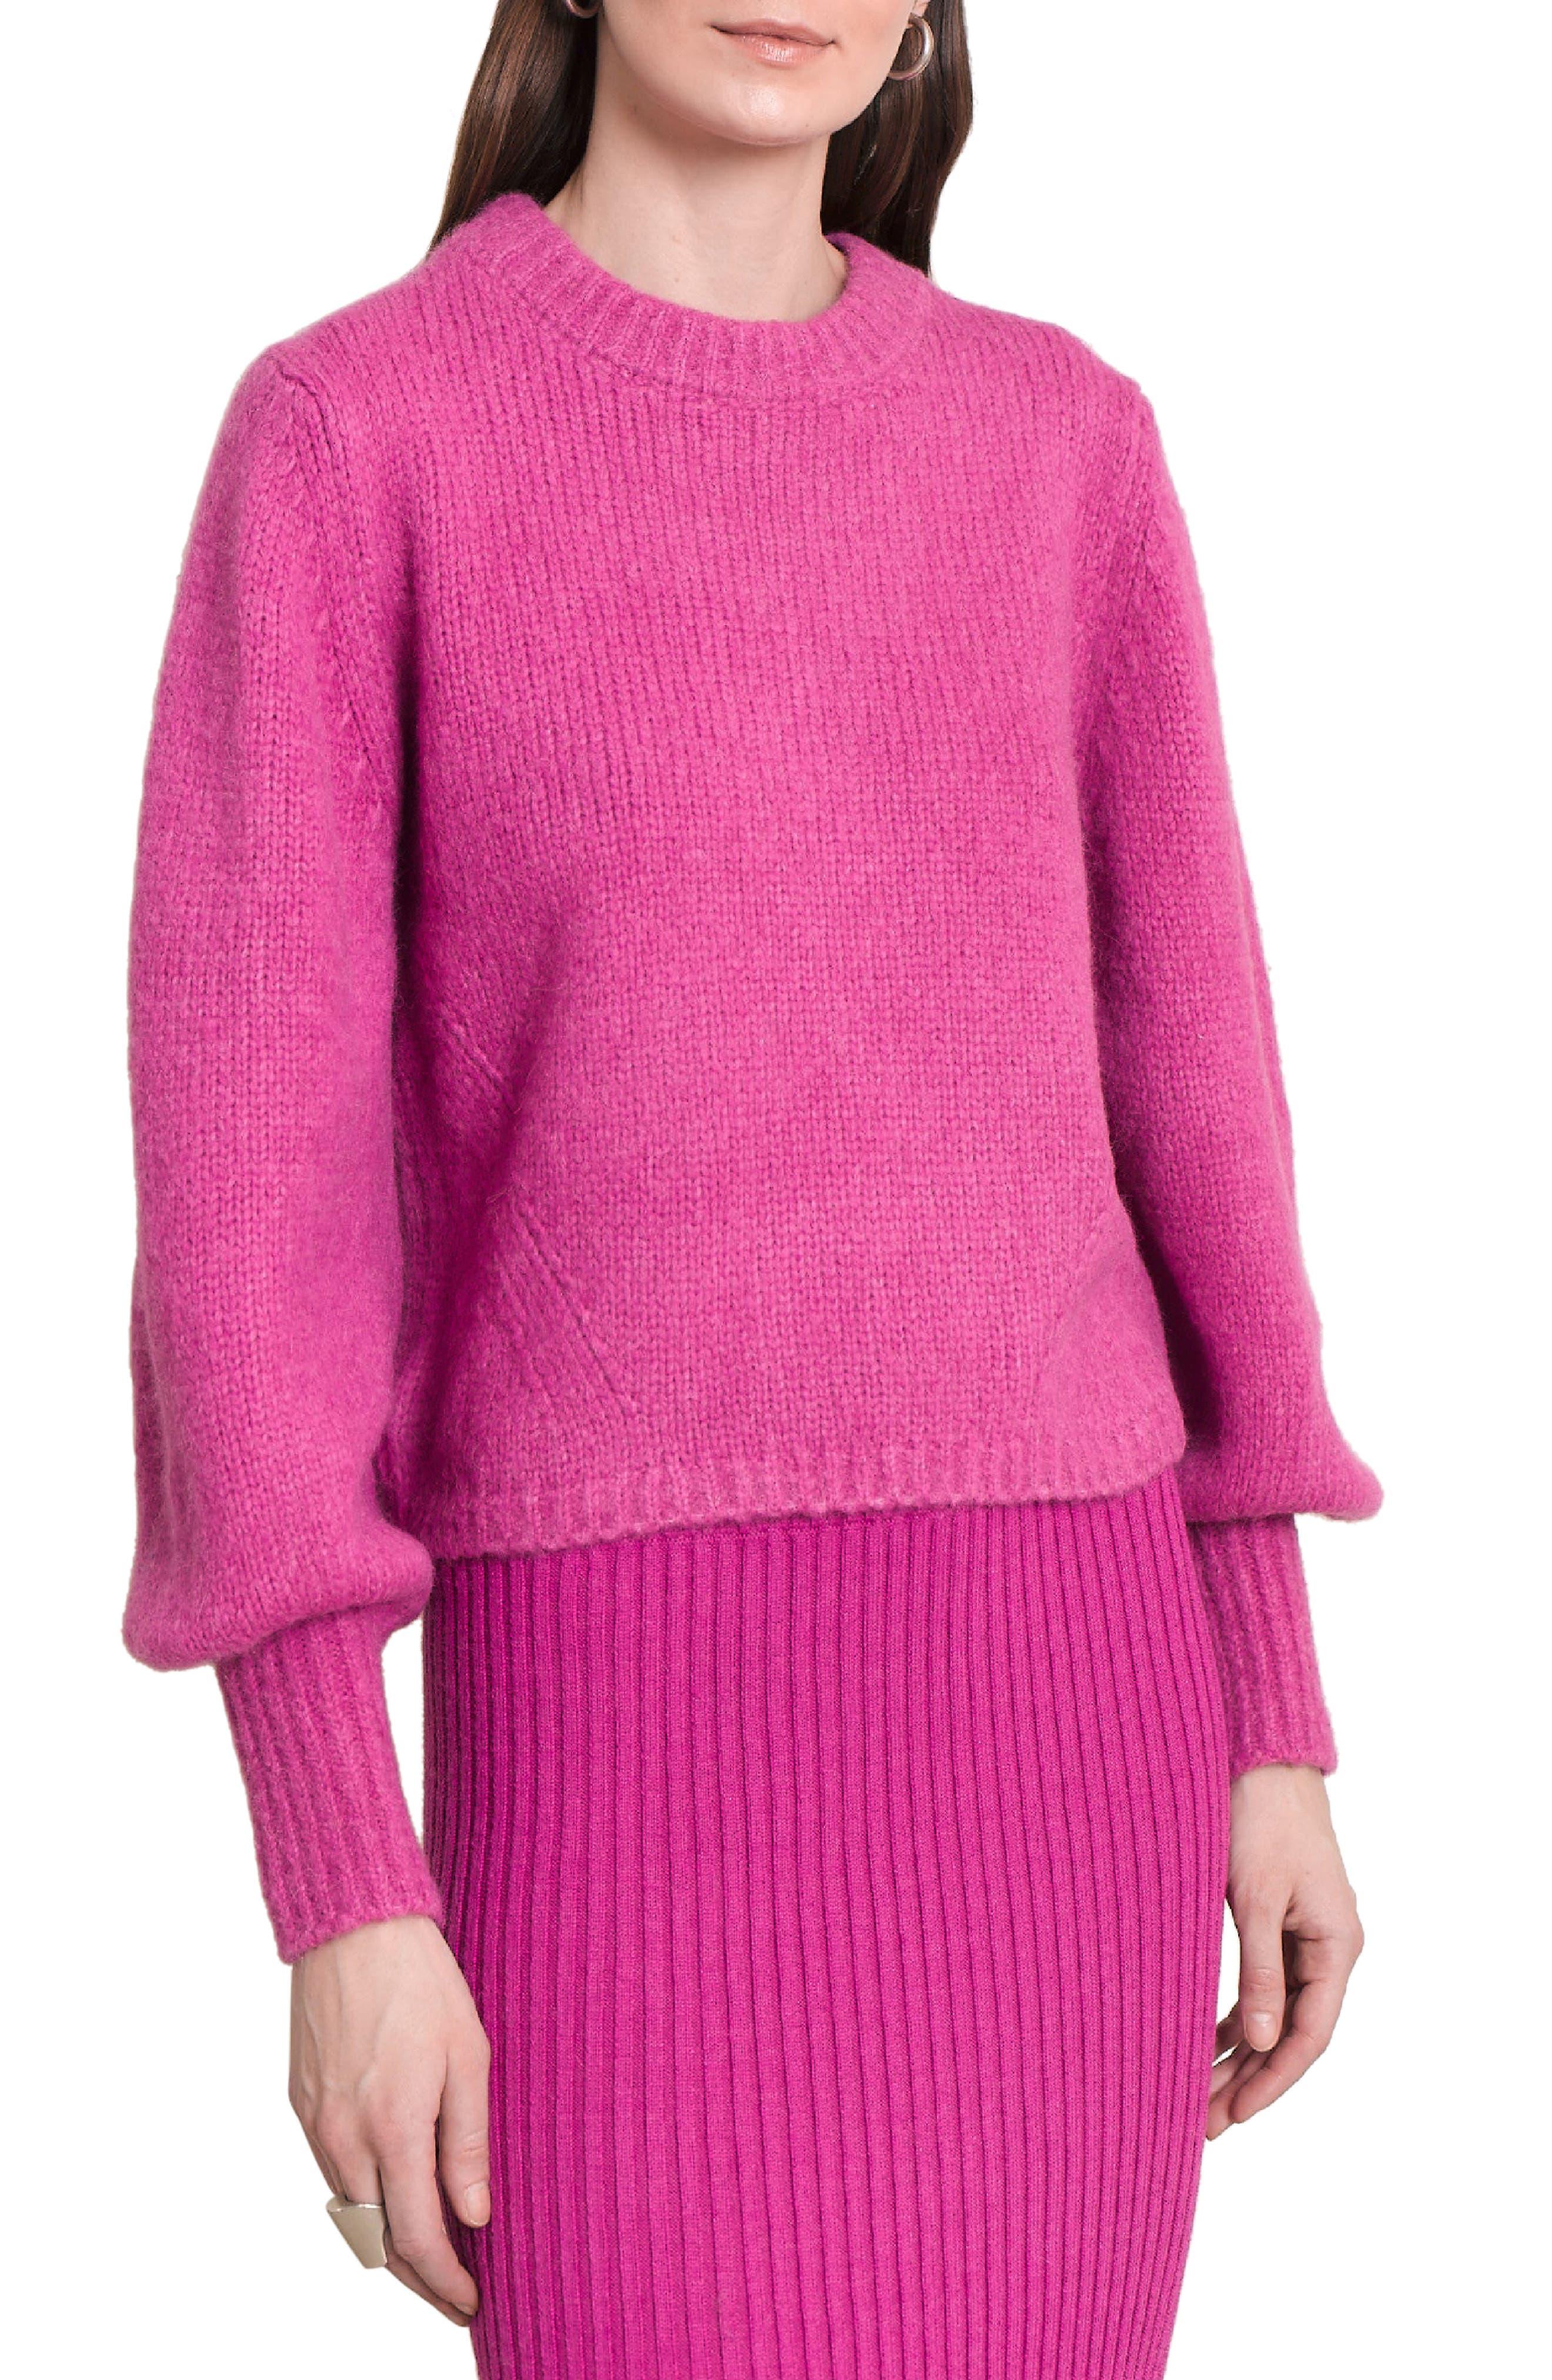 Kara Alpaca Blend Sweater